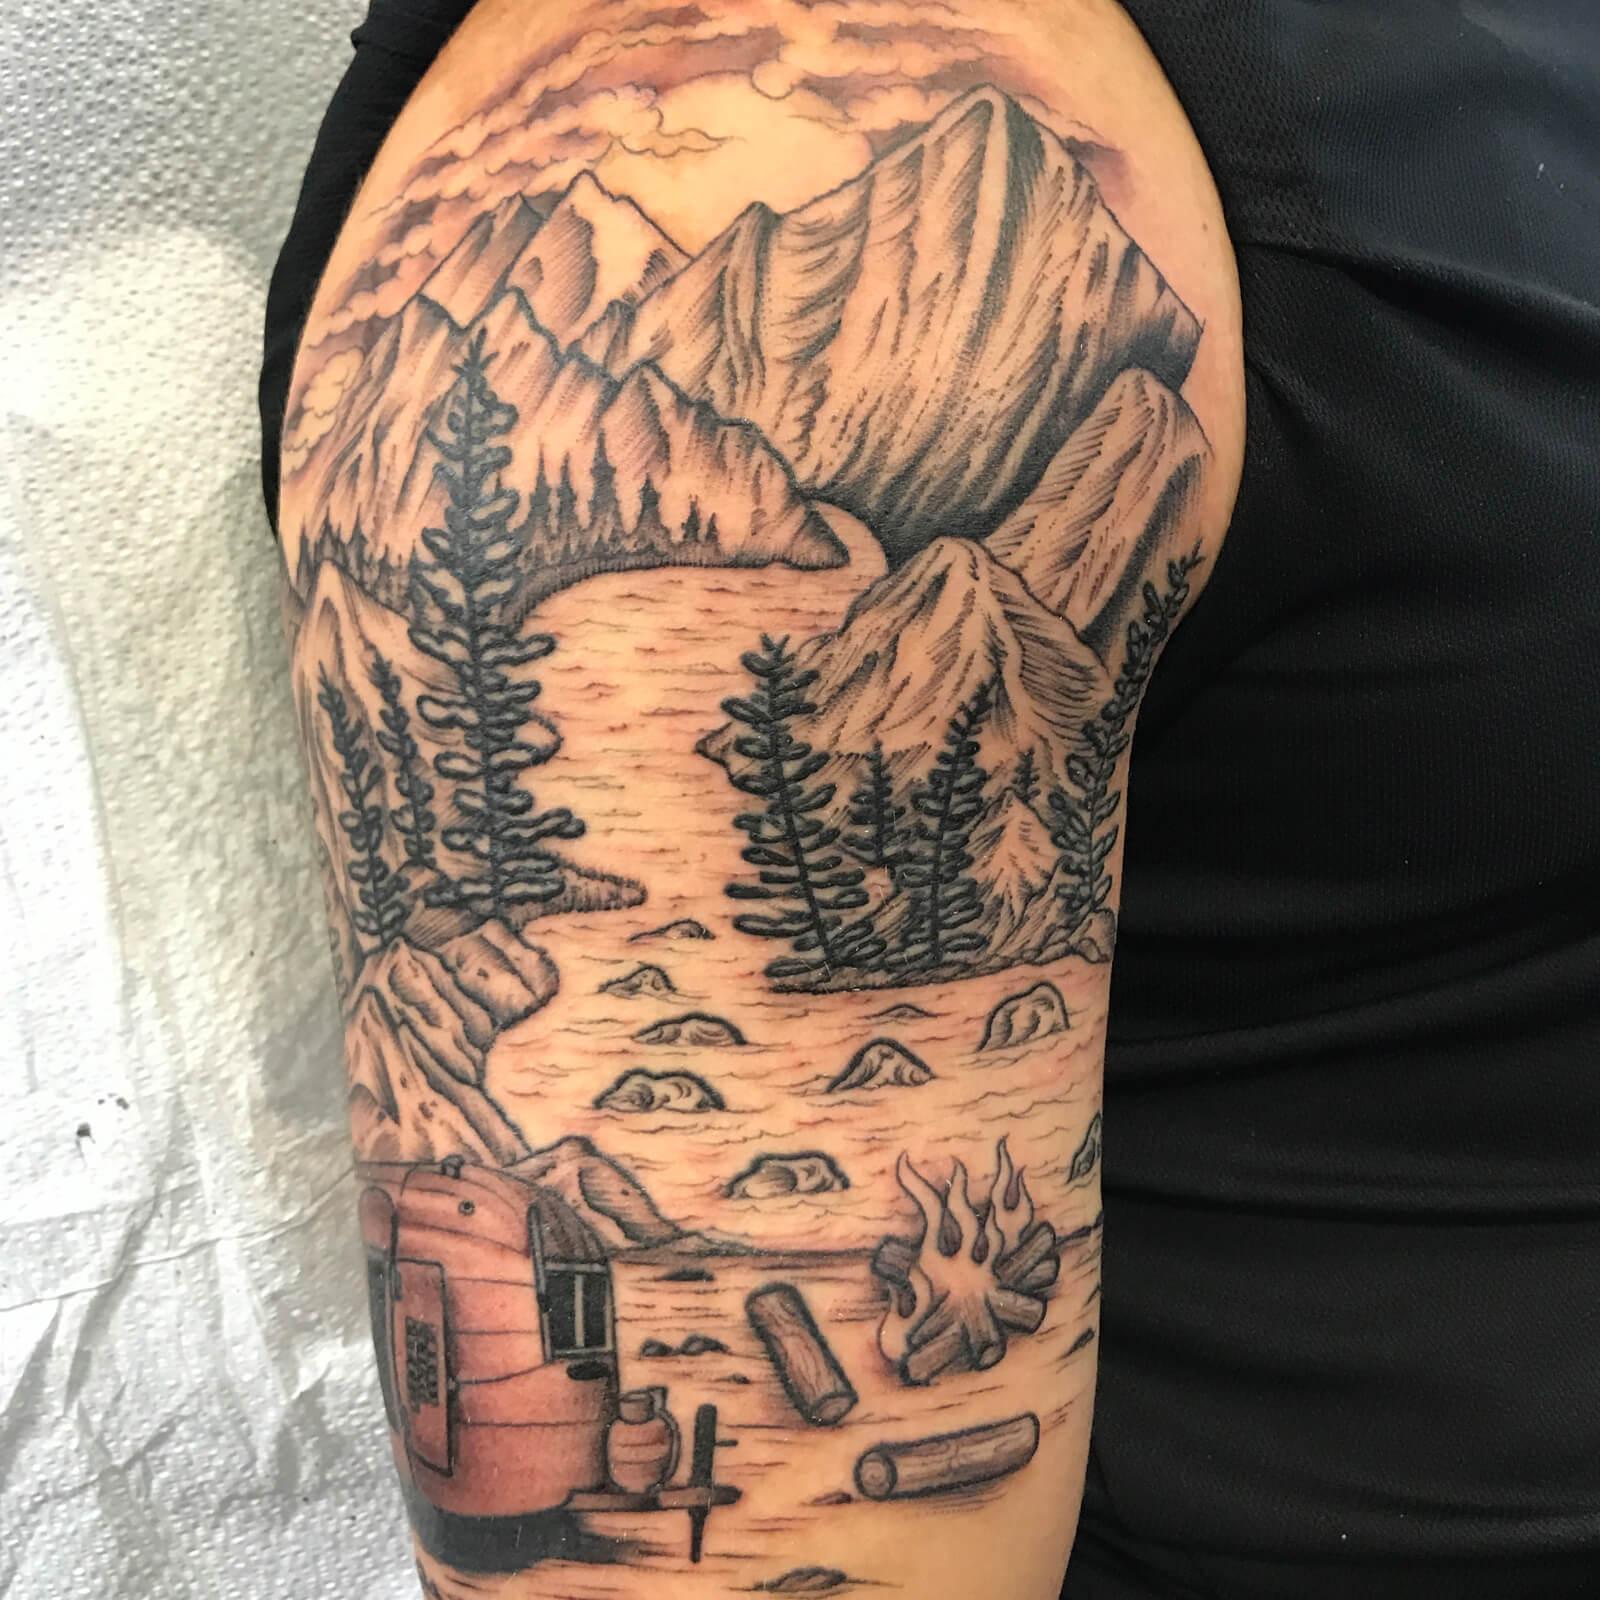 Cody-Miller-black-heart-tattoo-6